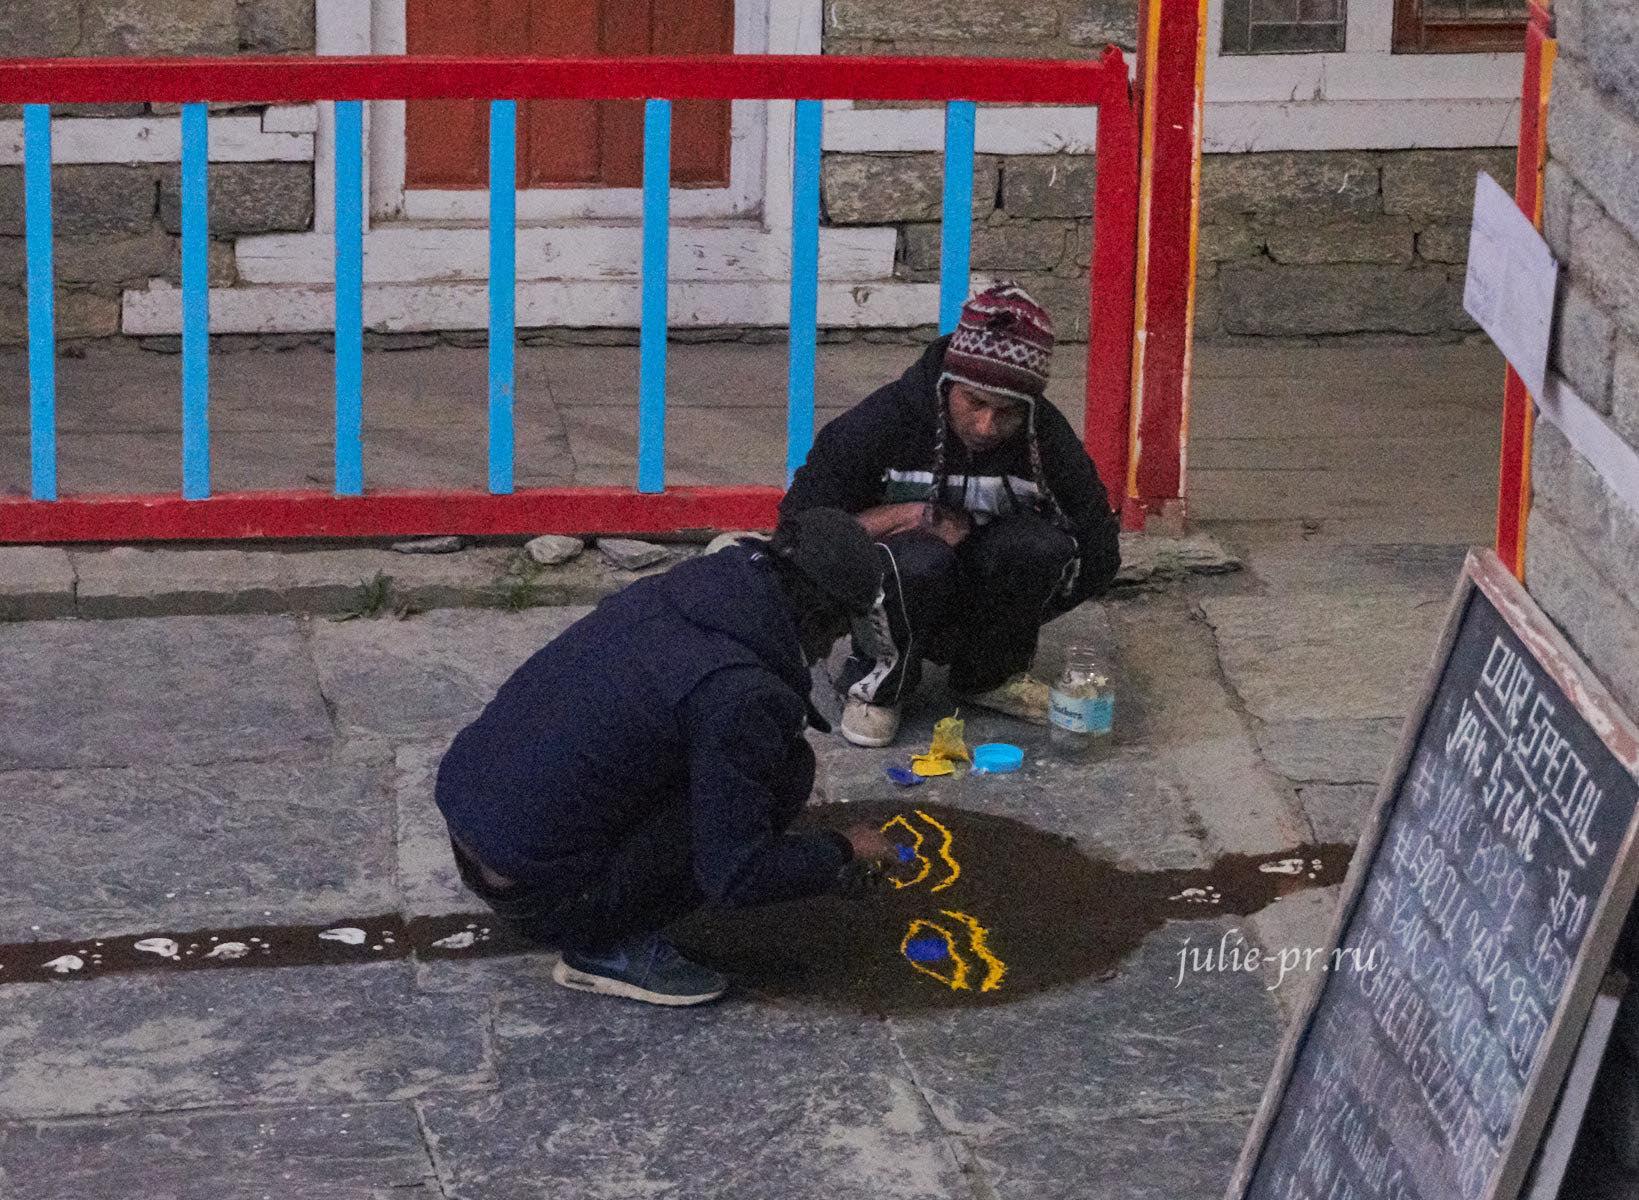 Непал, Аннапурна, Мананг, Люди, Праздник Тихар